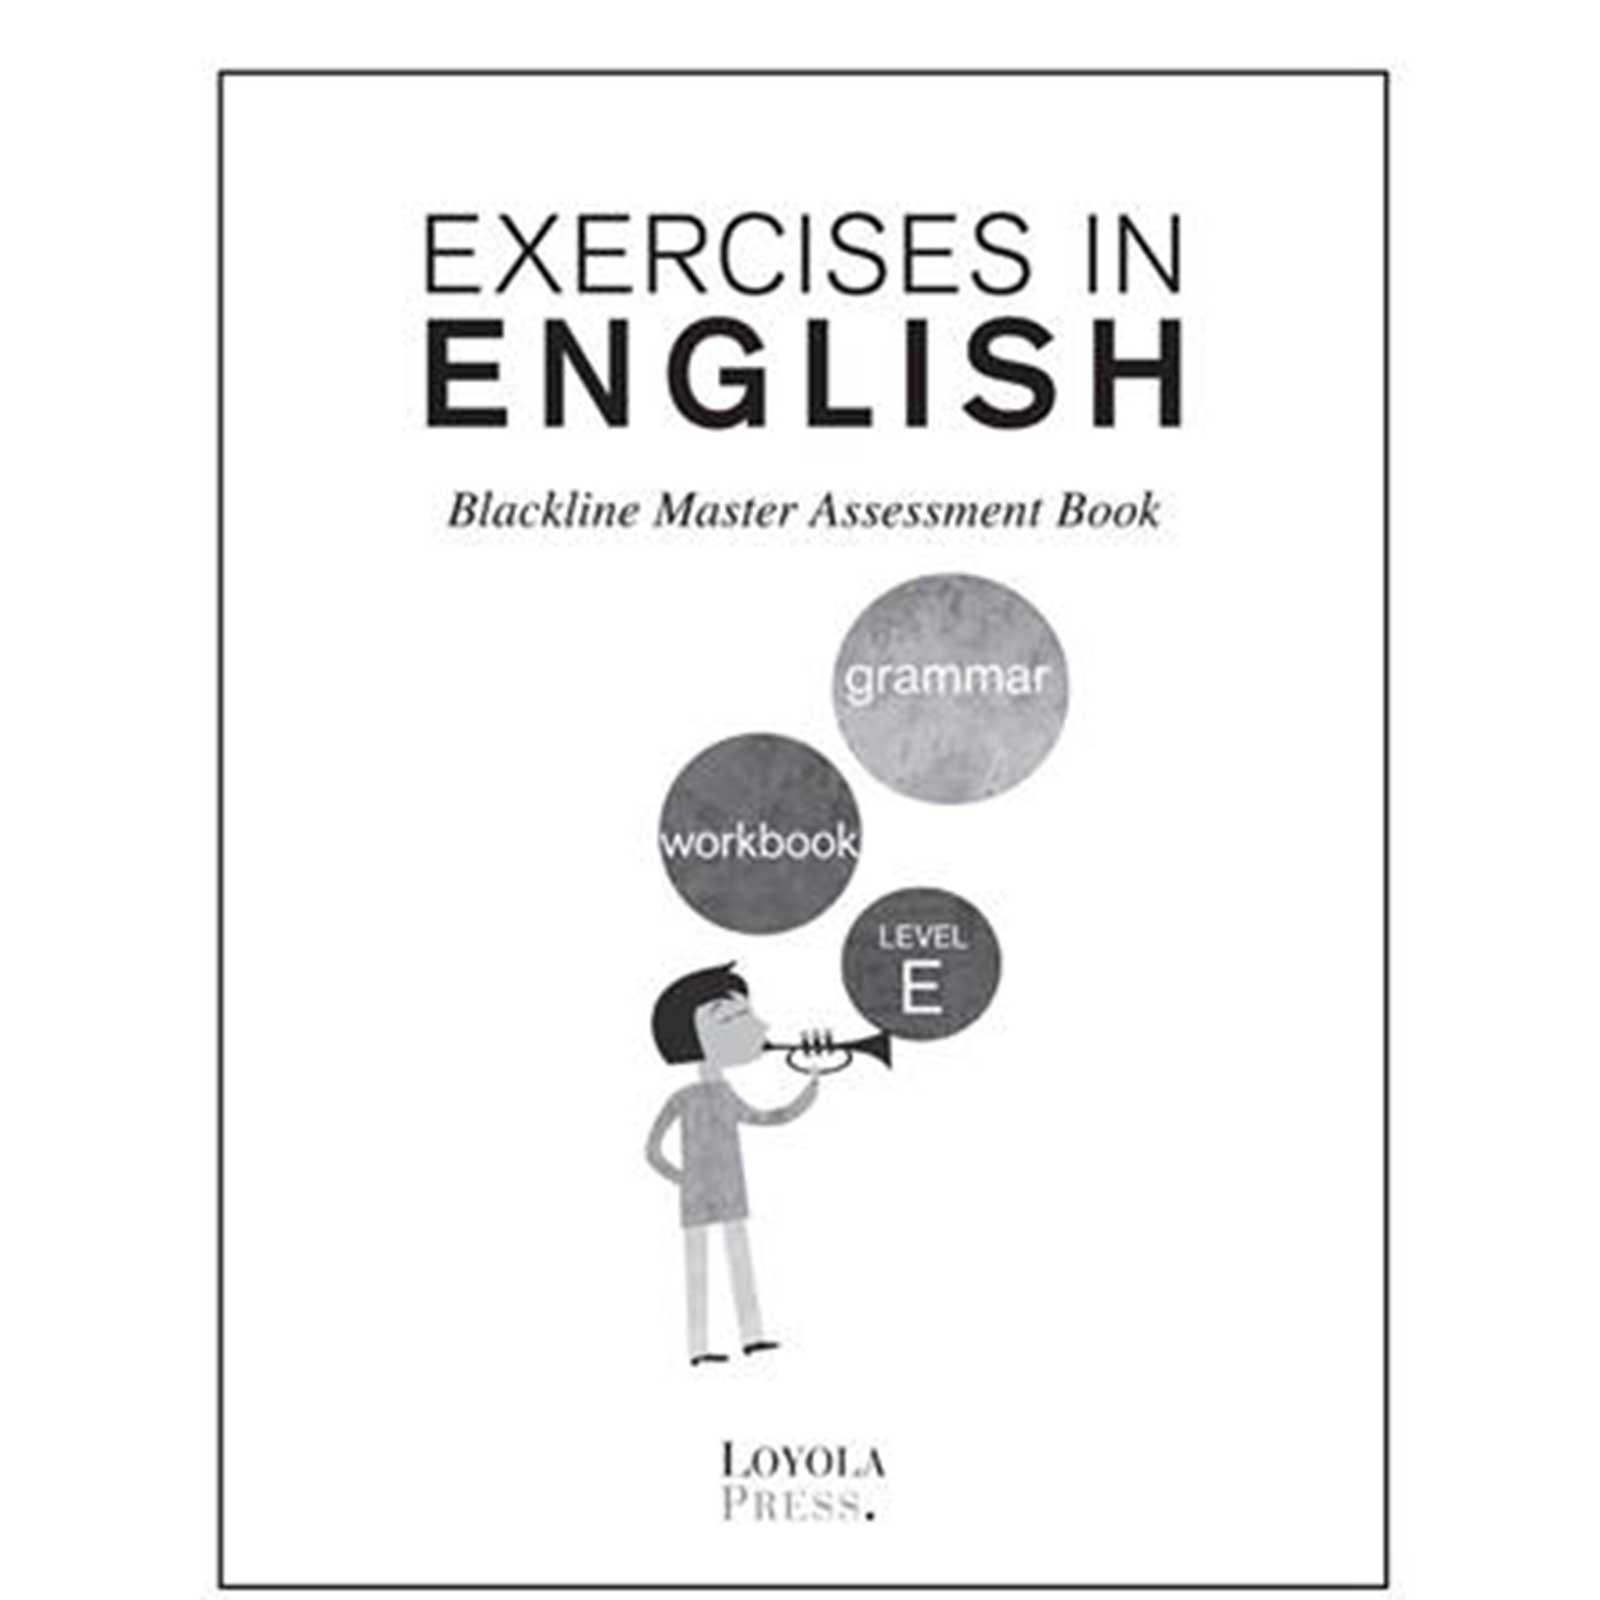 2013 Exercises in English Level E: Grade 5 Assessment Book